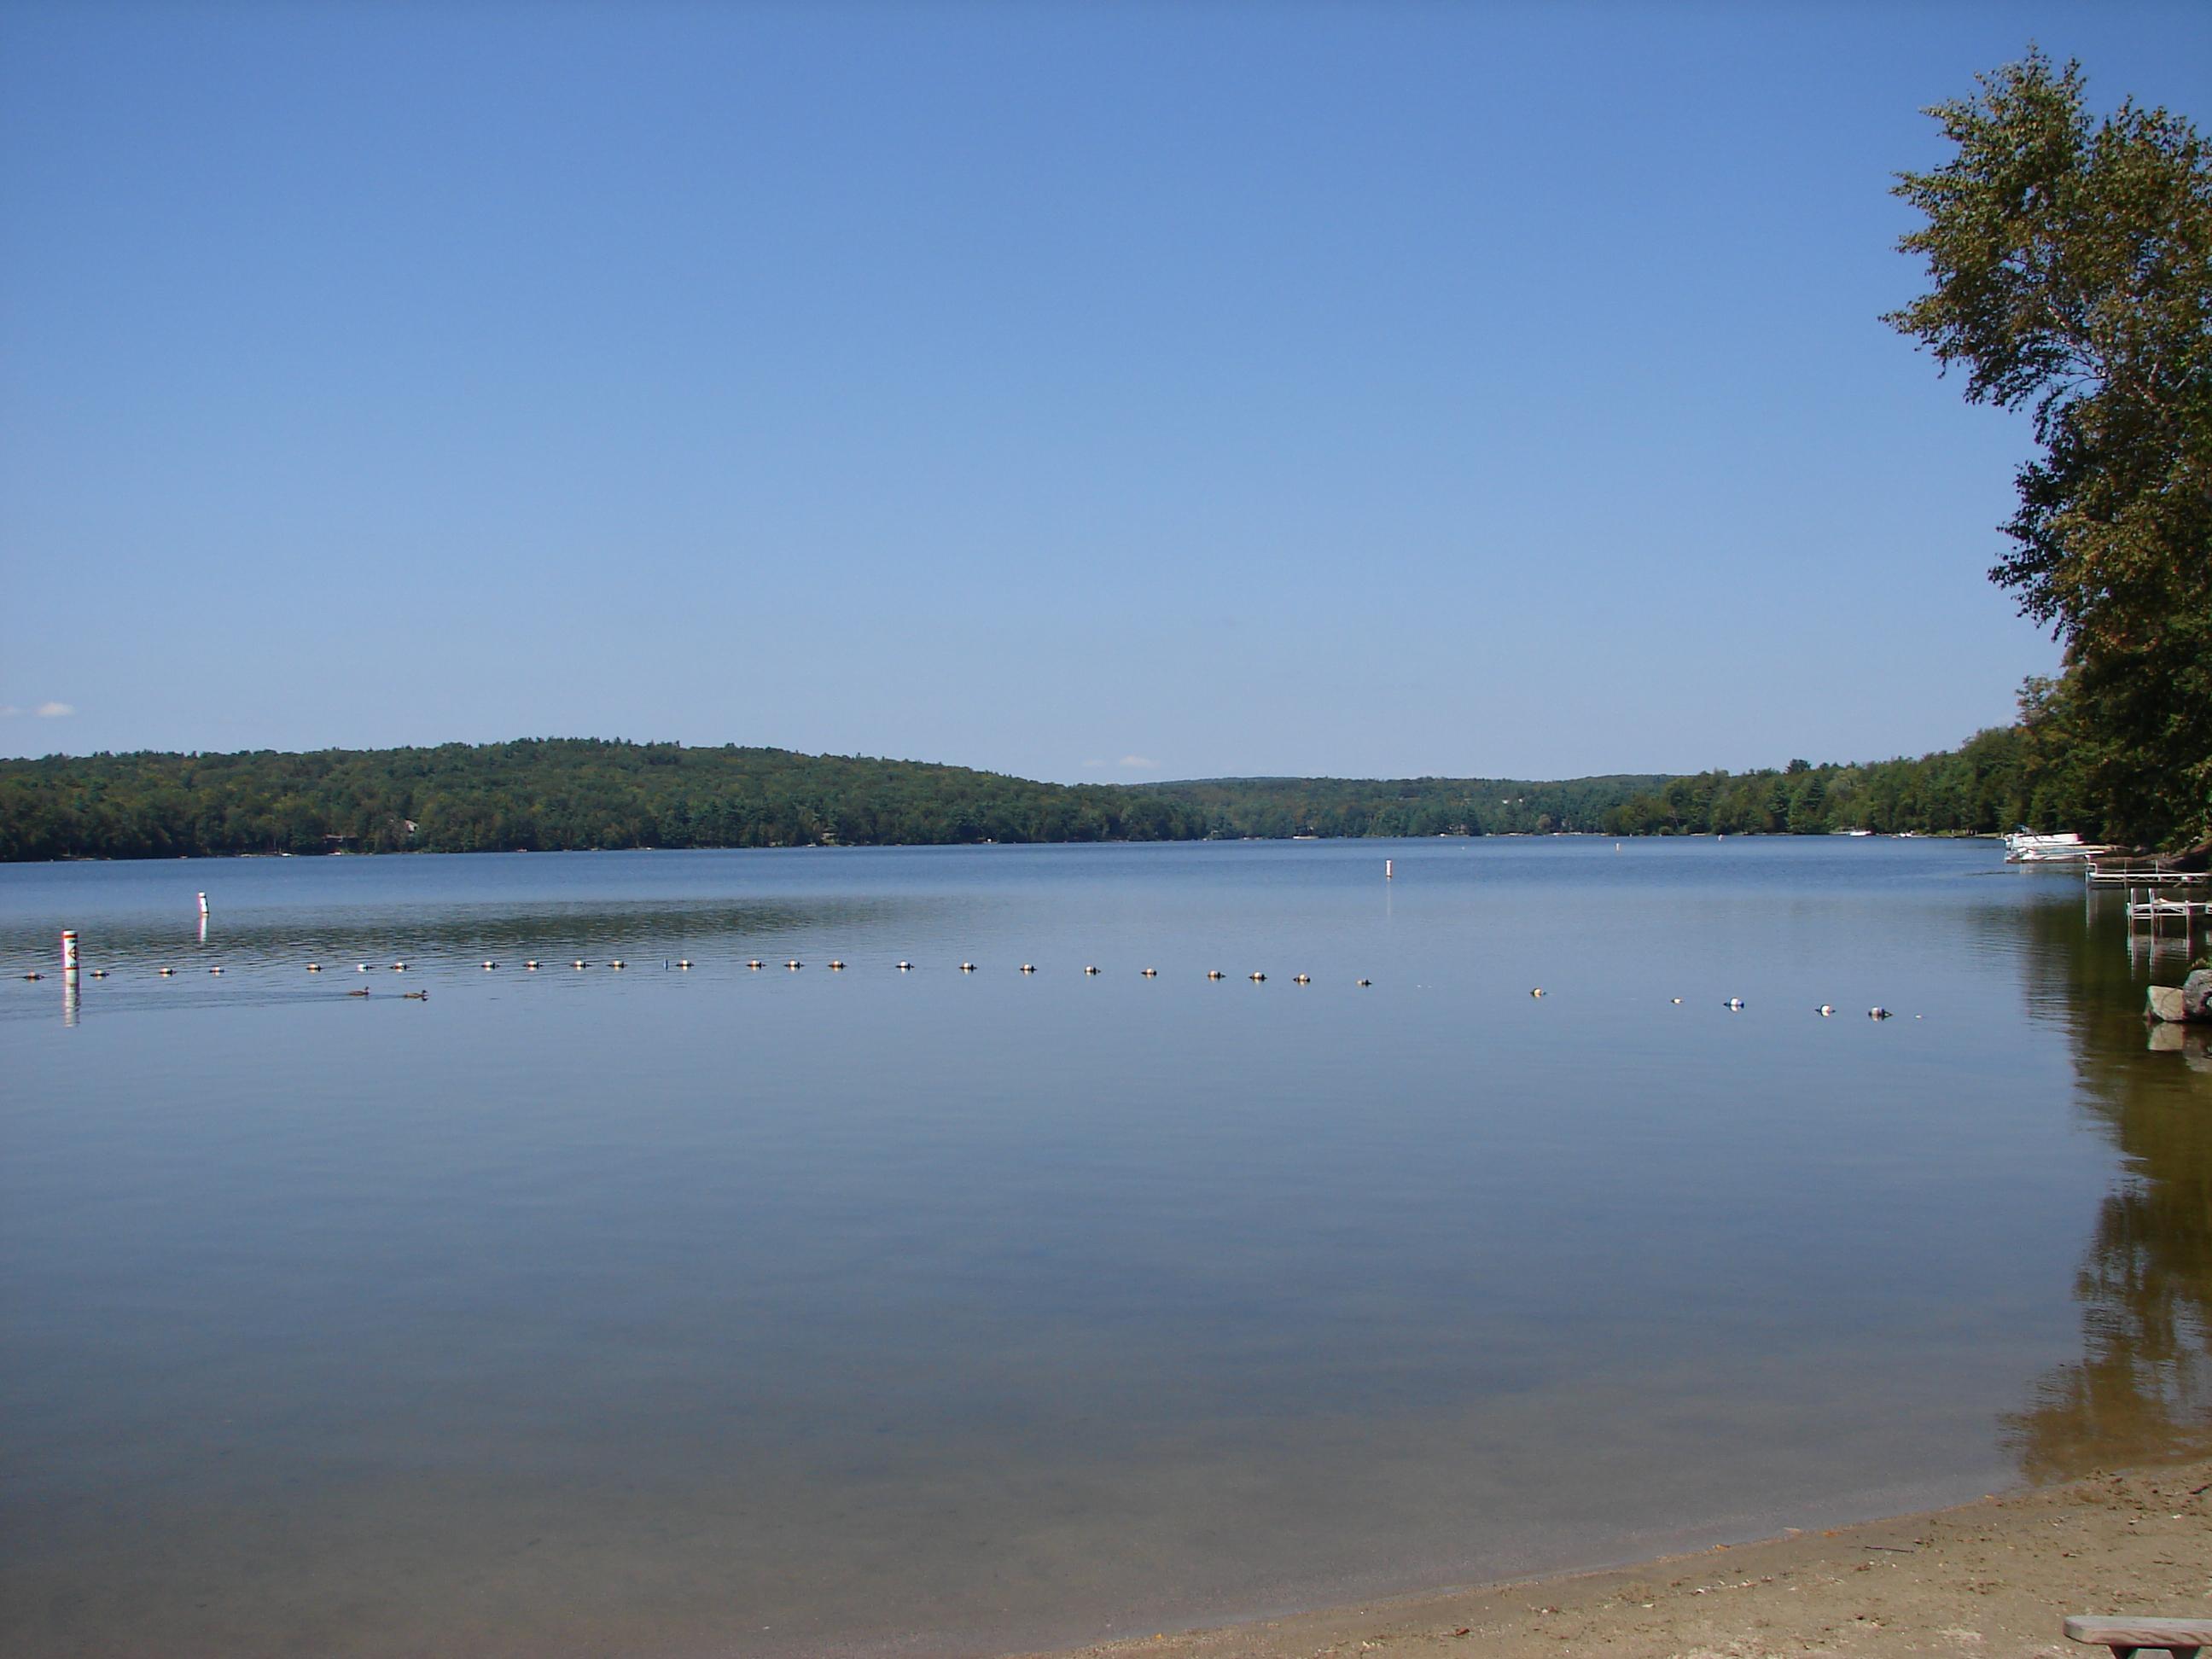 Land for Sale at Woodridge Lake Building Lot Lot 754 Cornwall Dr Goshen, Connecticut, 06756 United States